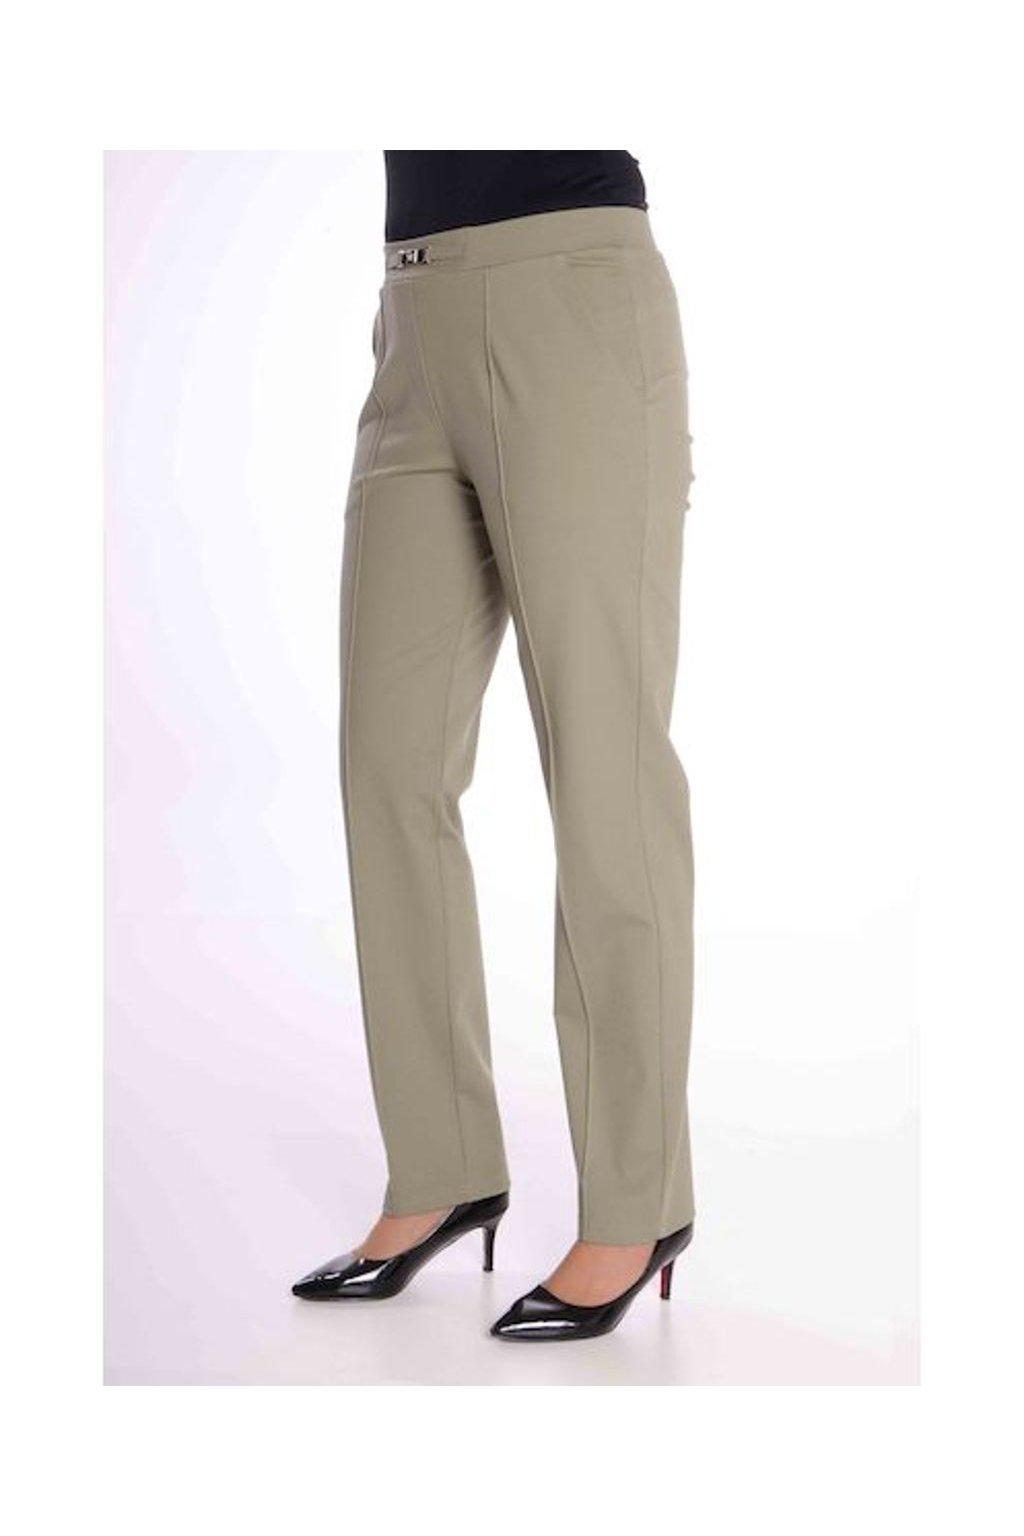 66T Kalhoty Avanti s puky (Velikost 36, Barva Zelená)